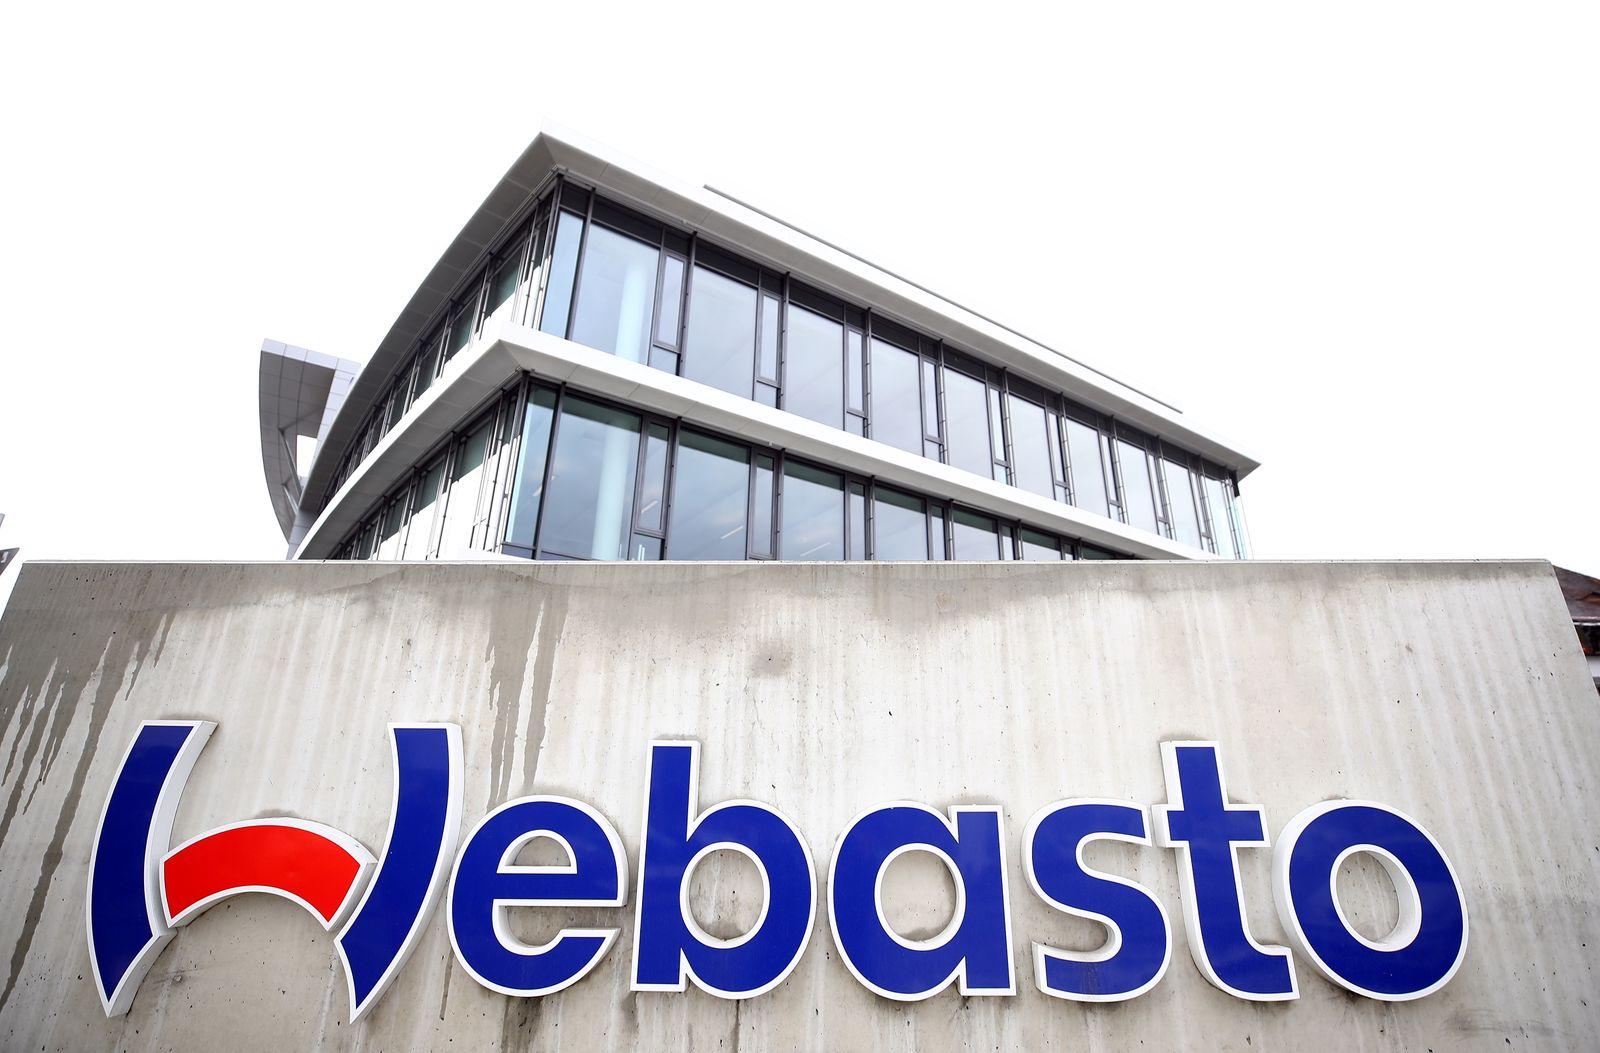 Webasto / Zentrale